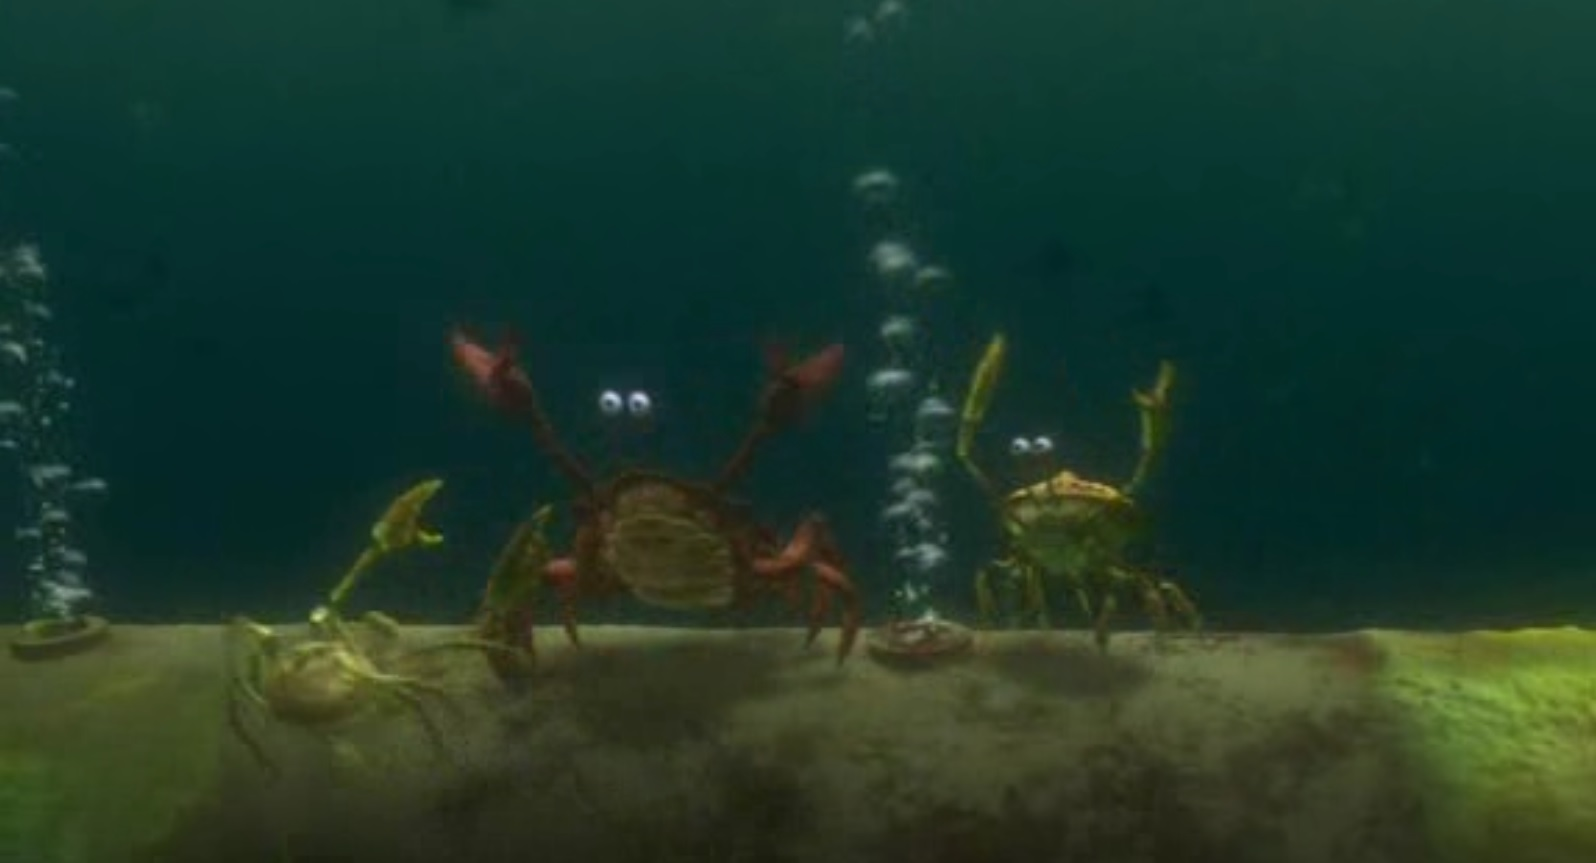 Verde Zona: Cine Ambiental; Buscando a Nemo